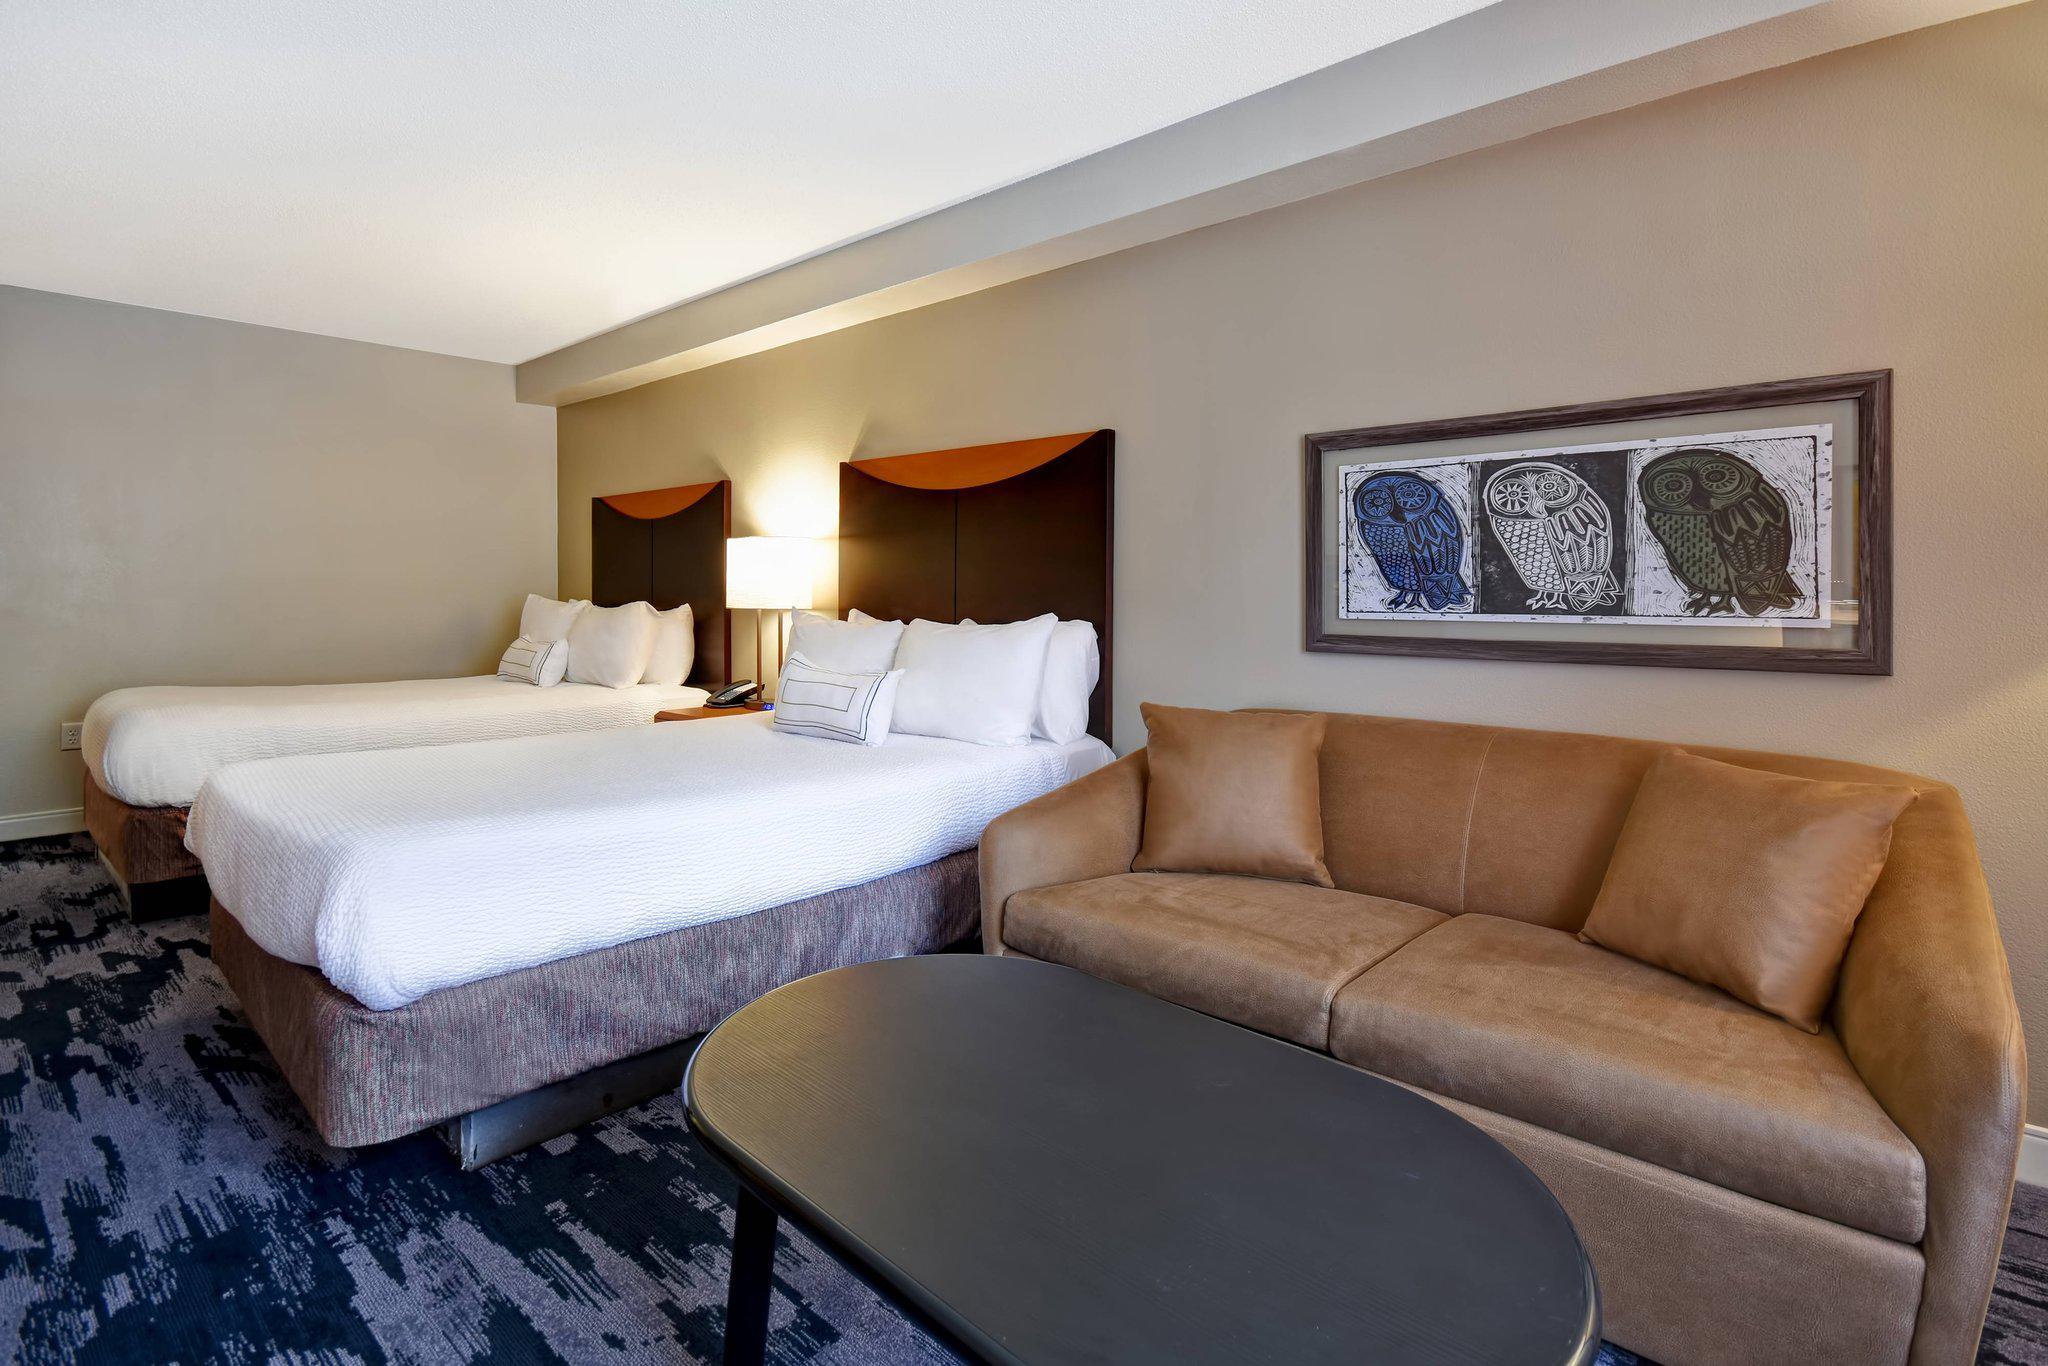 Fairfield Inn & Suites by Marriott Atlanta Kennesaw